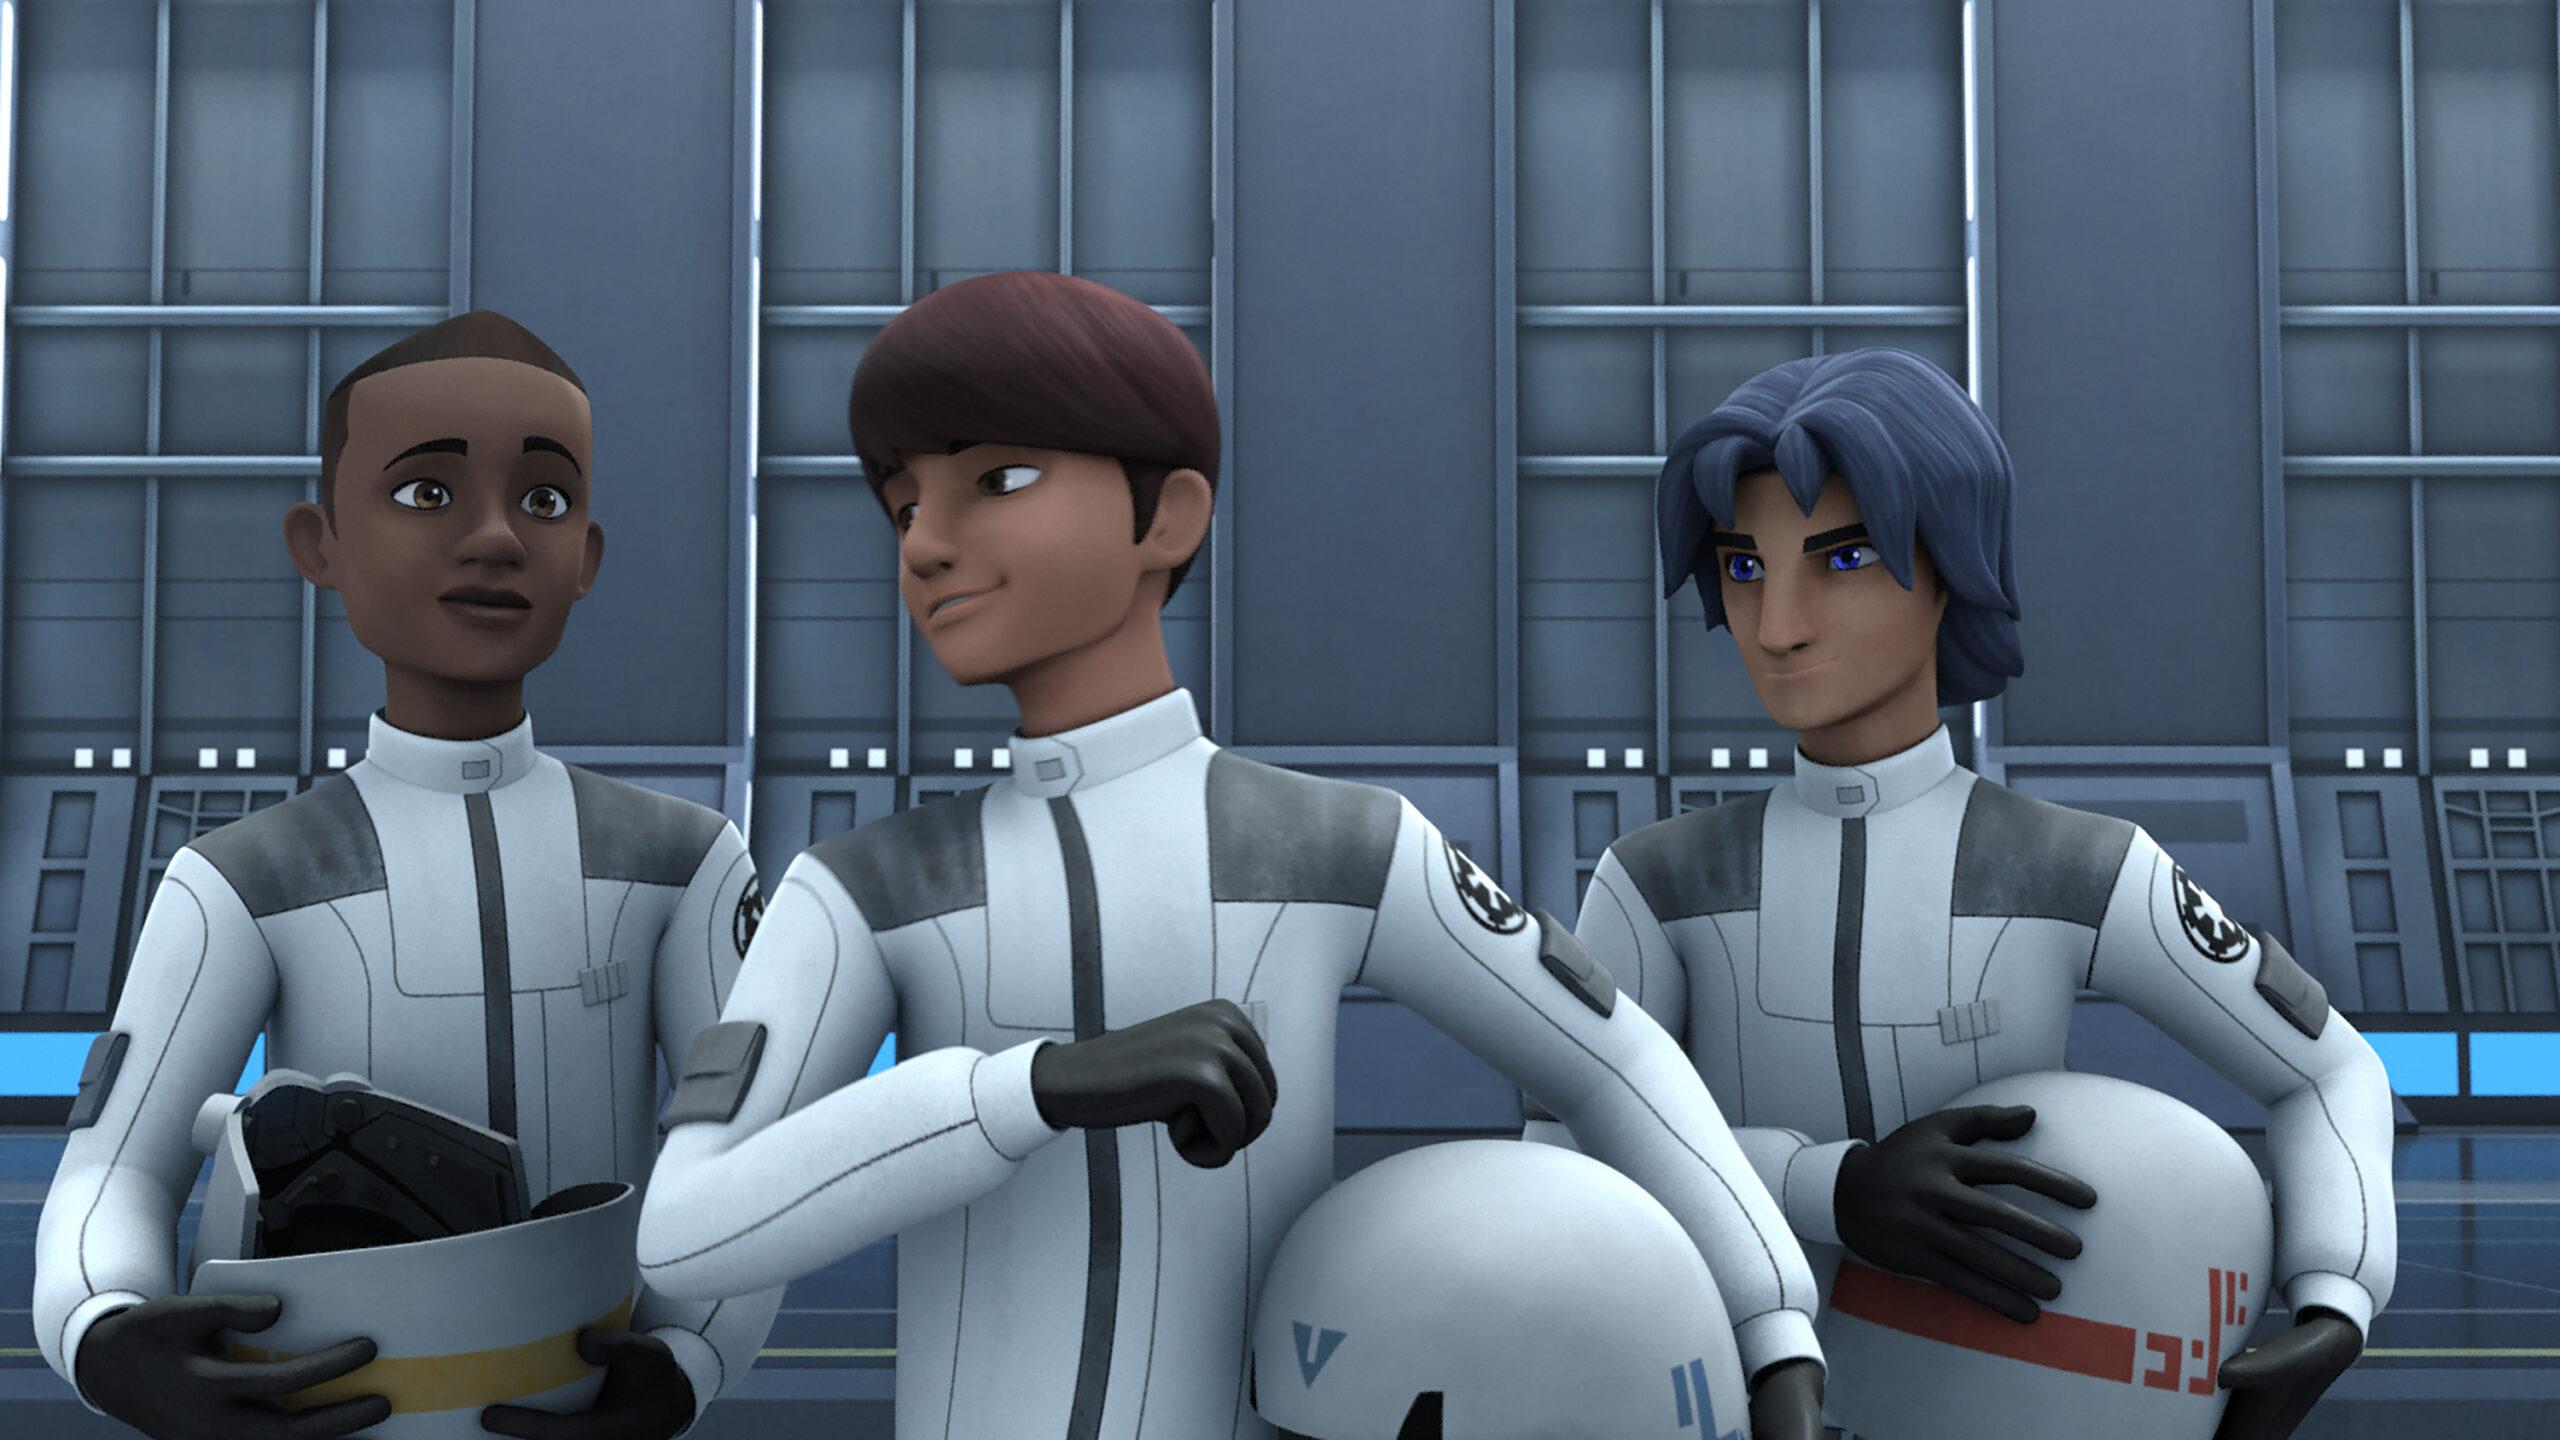 Star Wars: Rebelii Sezonul 1 Episodul 5 Online Subtitrat